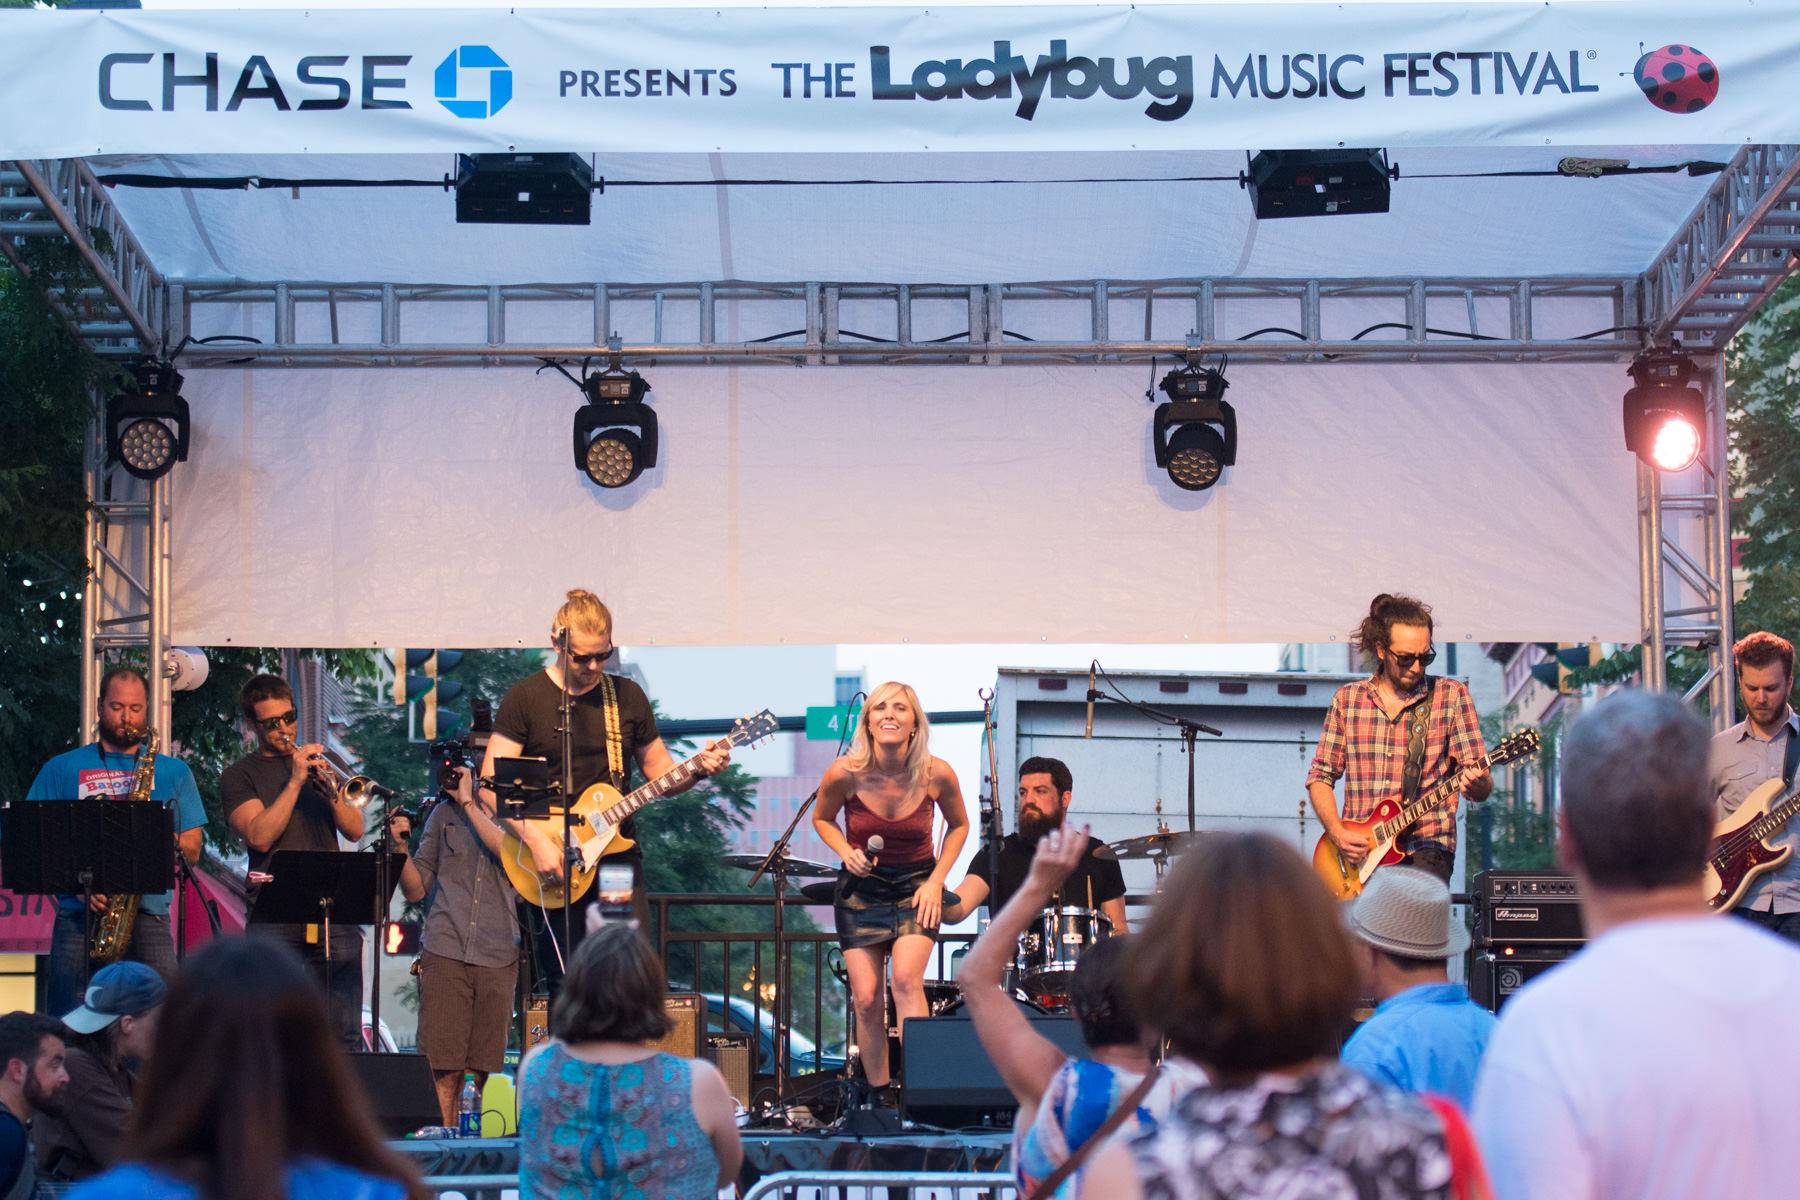 Ladybug music festival 2017 Wilmington DE